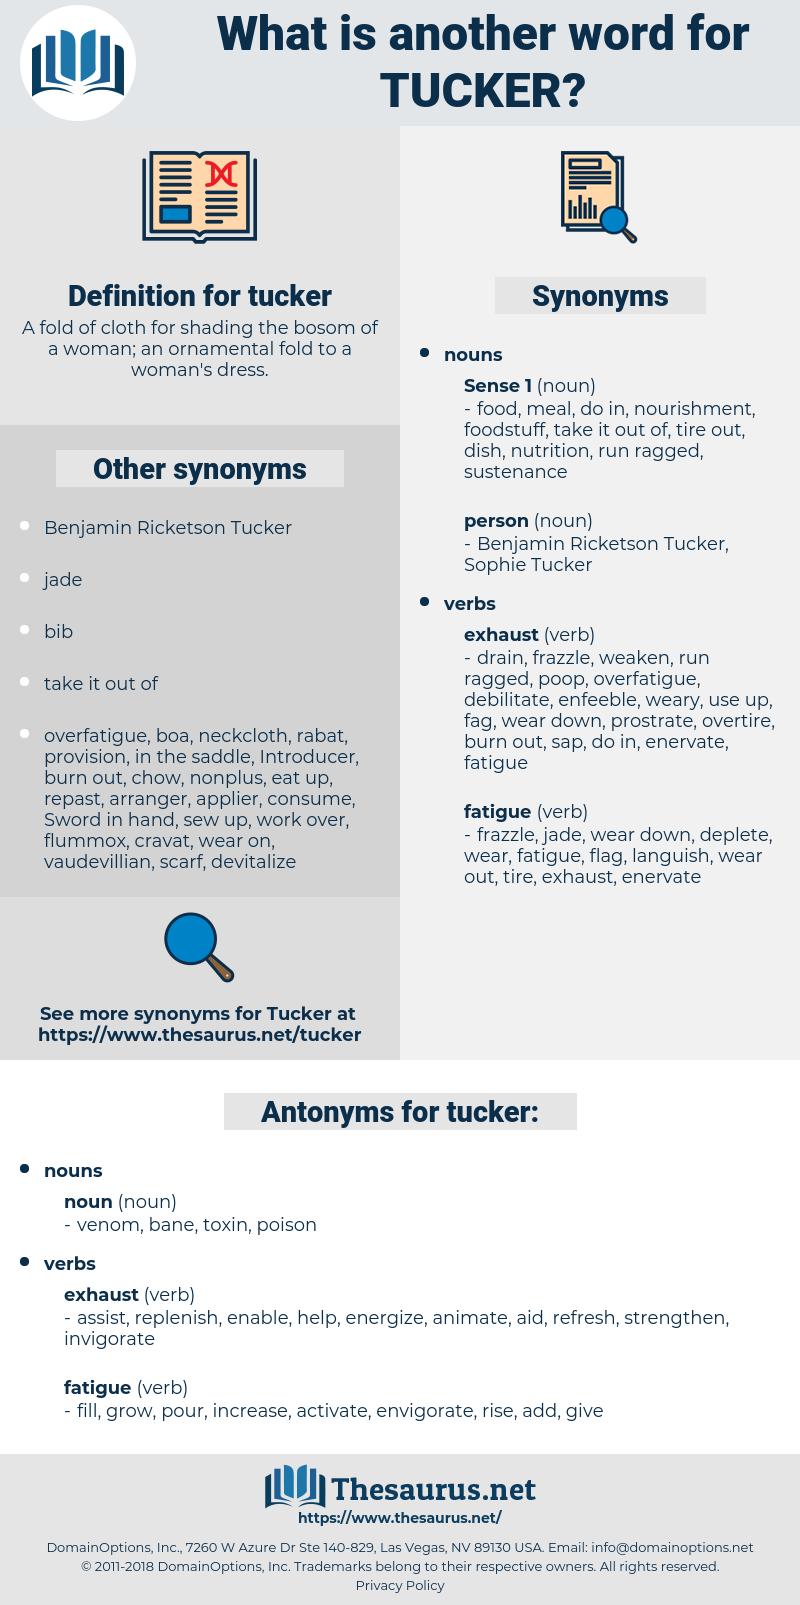 tucker, synonym tucker, another word for tucker, words like tucker, thesaurus tucker